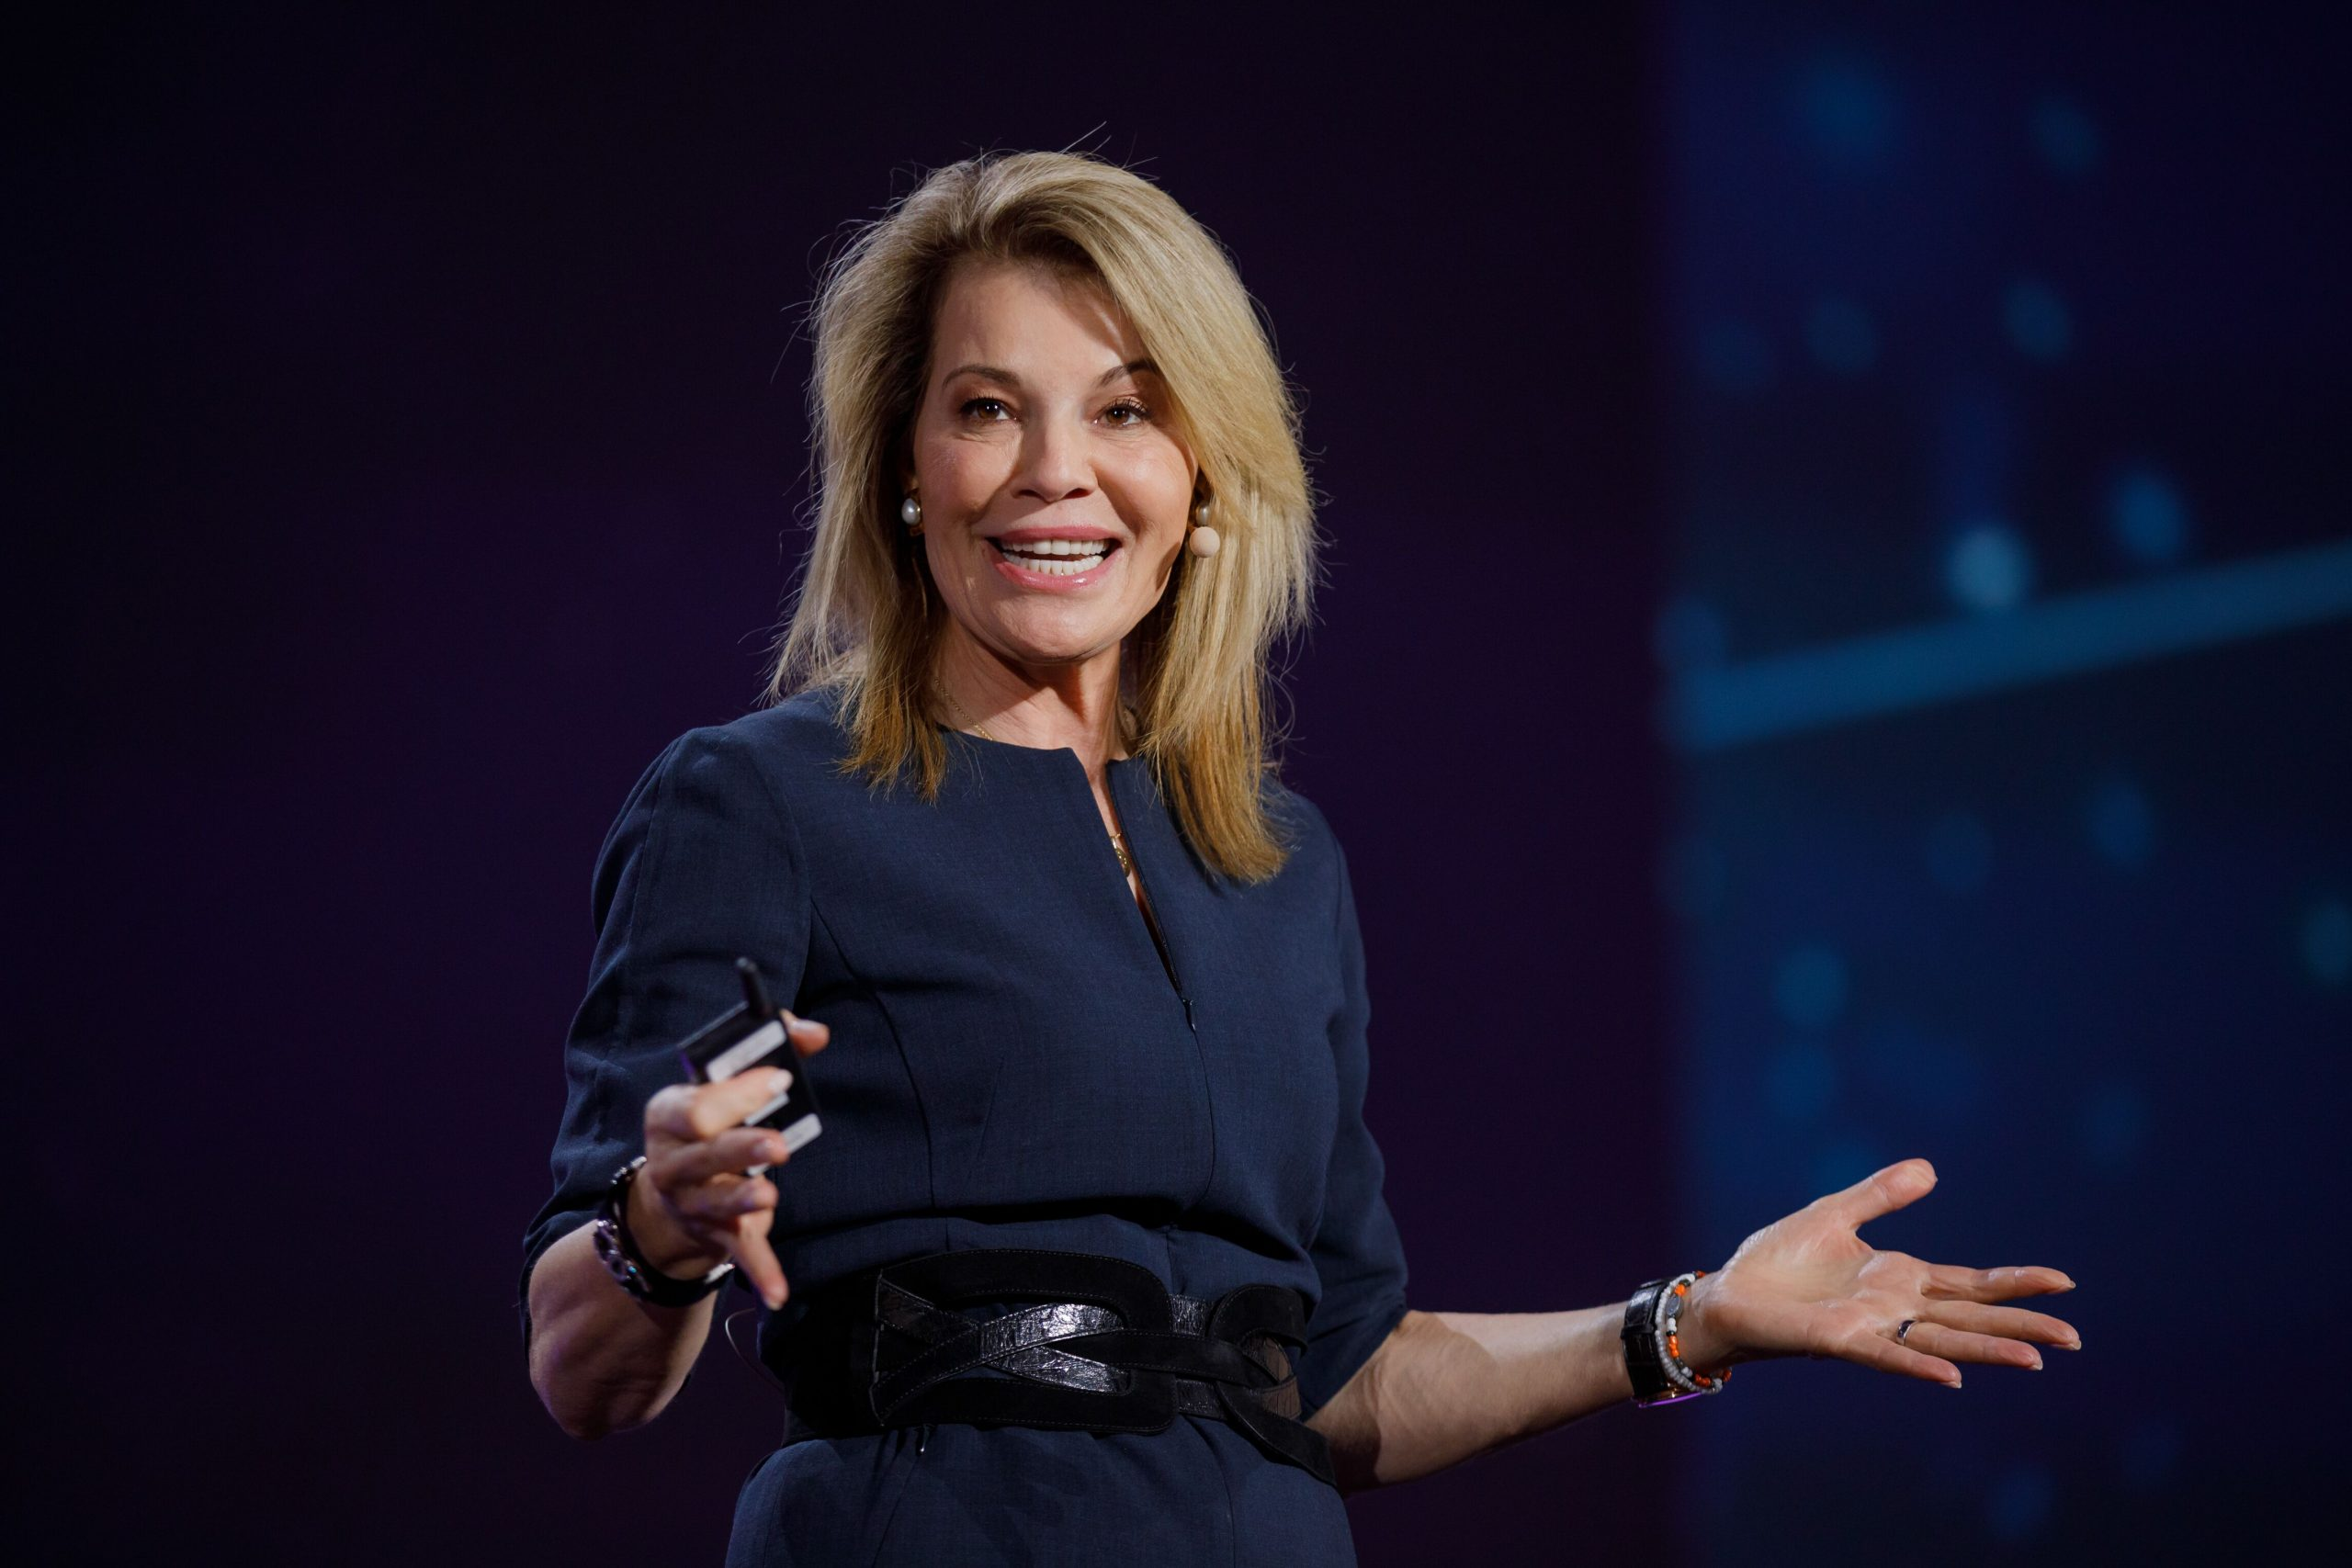 Teresa-Carlson-Vice-President-AWS-Worldwide-Public-Sector-Keynote-Photo-2-scaled.jpg